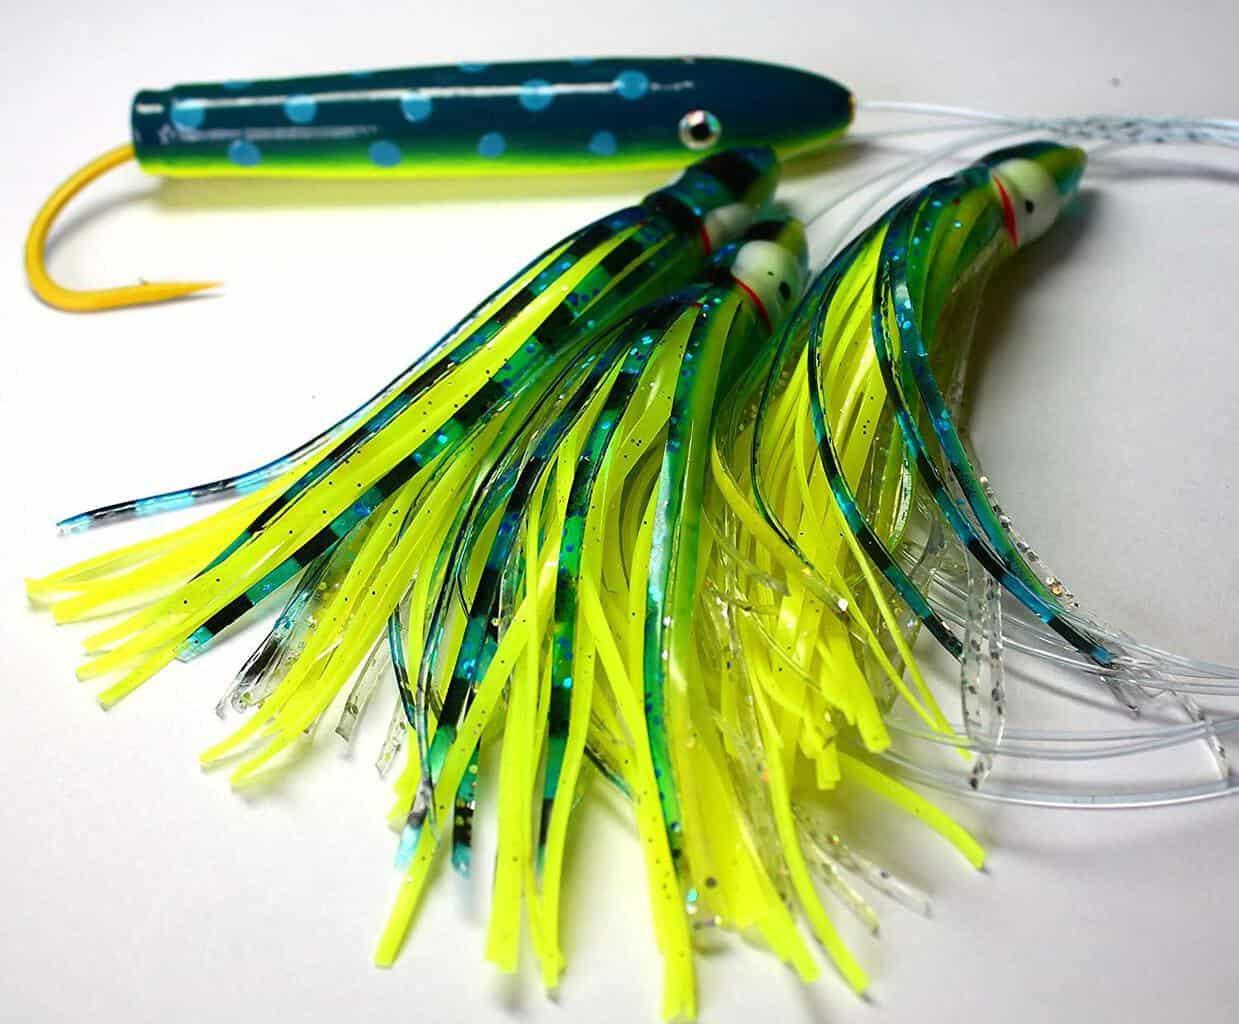 Best Bluefin and Yellowfin Tuna Fishing Lures - Sportfishing